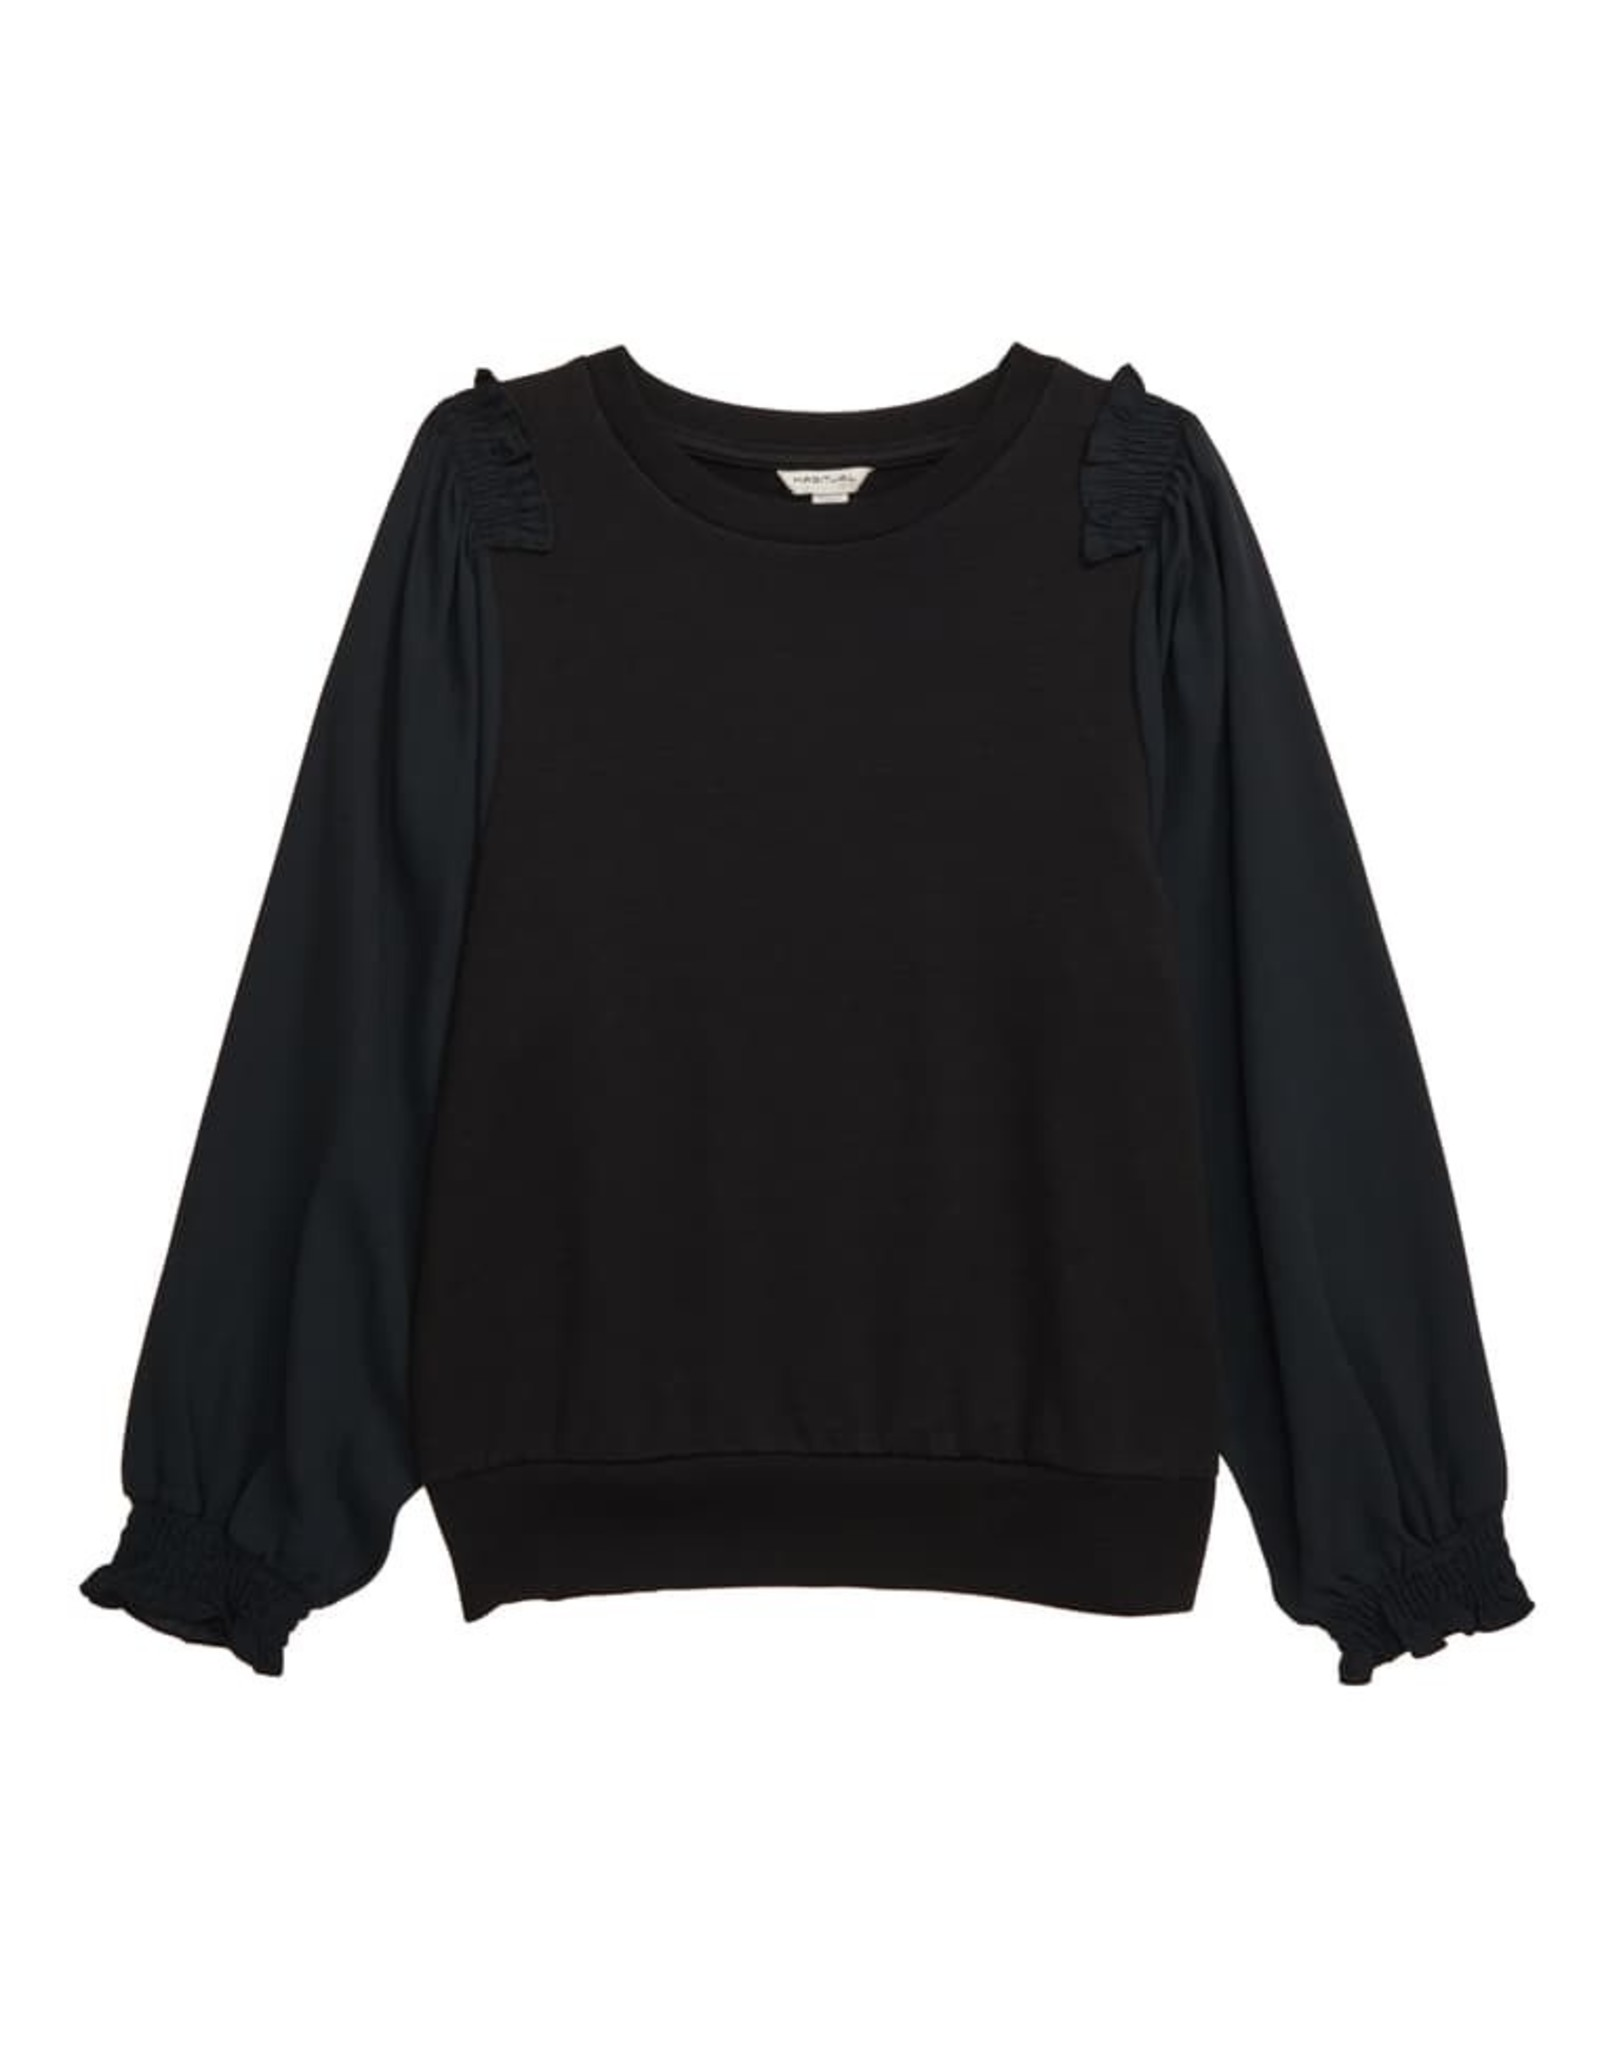 Habitual girl Habitual Girl Scarlette Brushed Knit/Woven Top